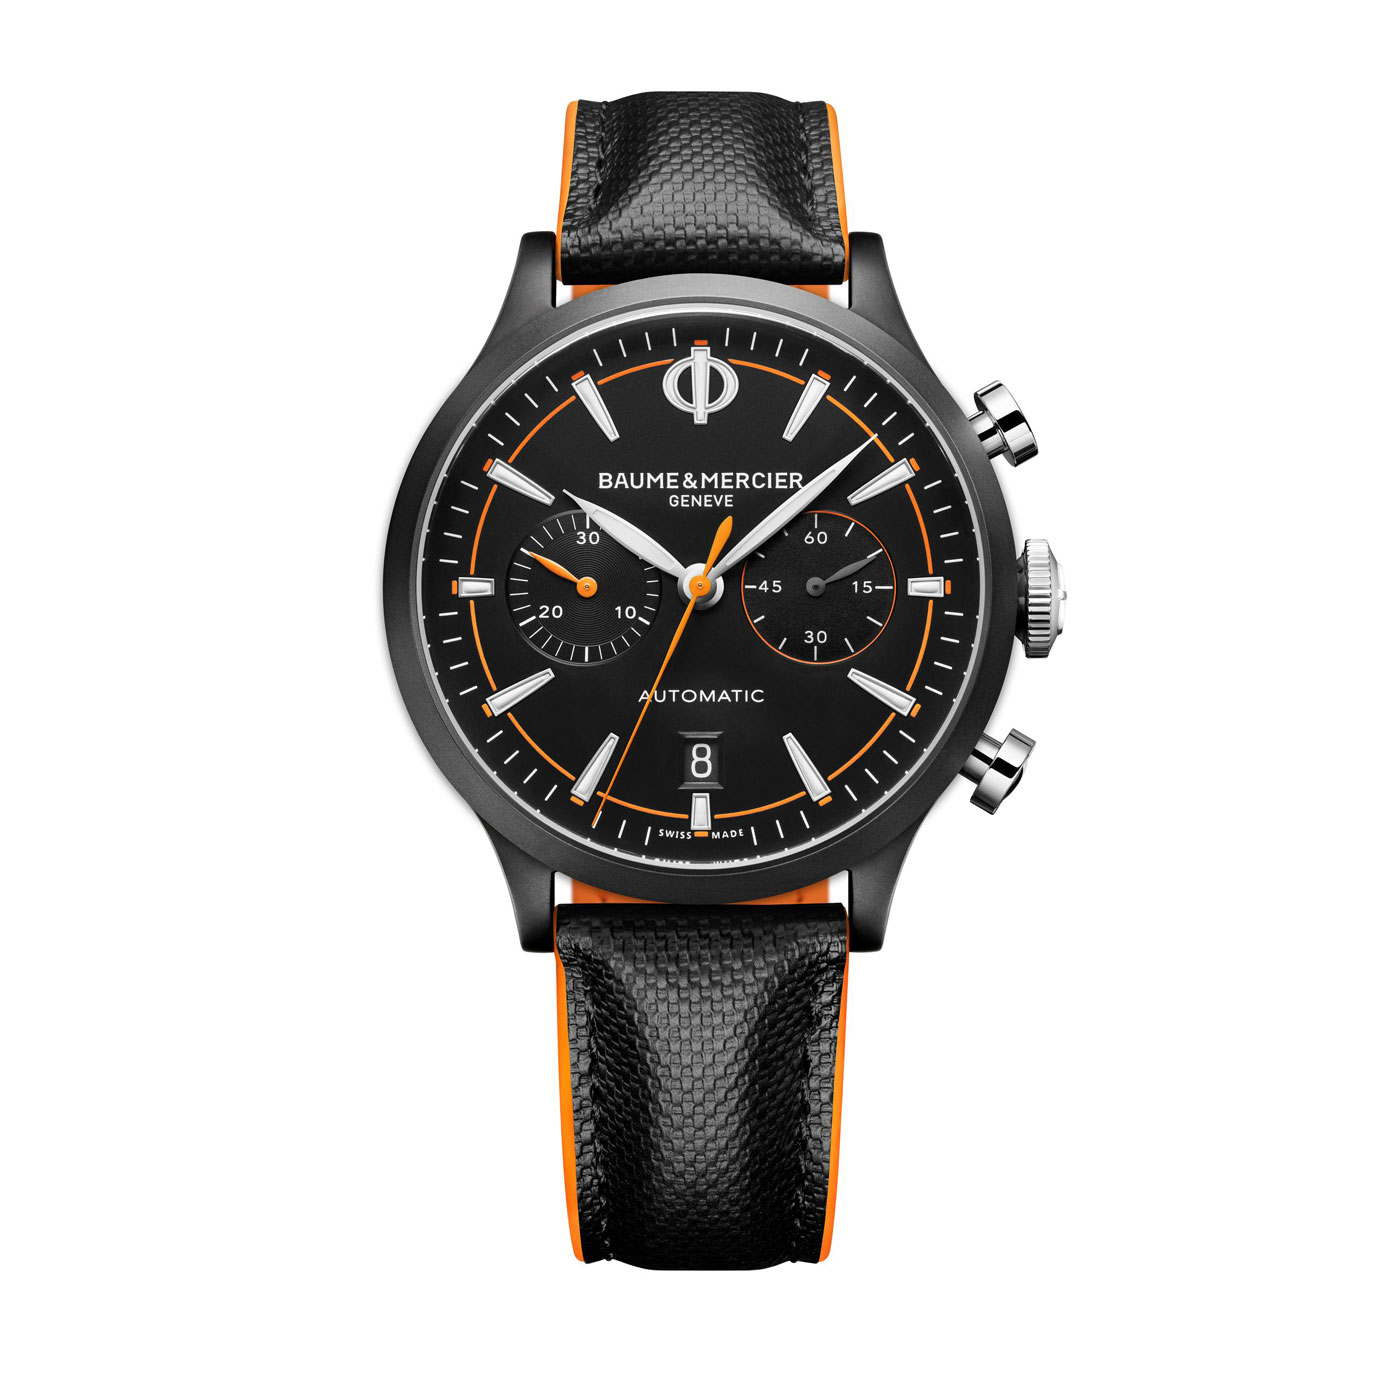 Baume & Mercier Capeland watch